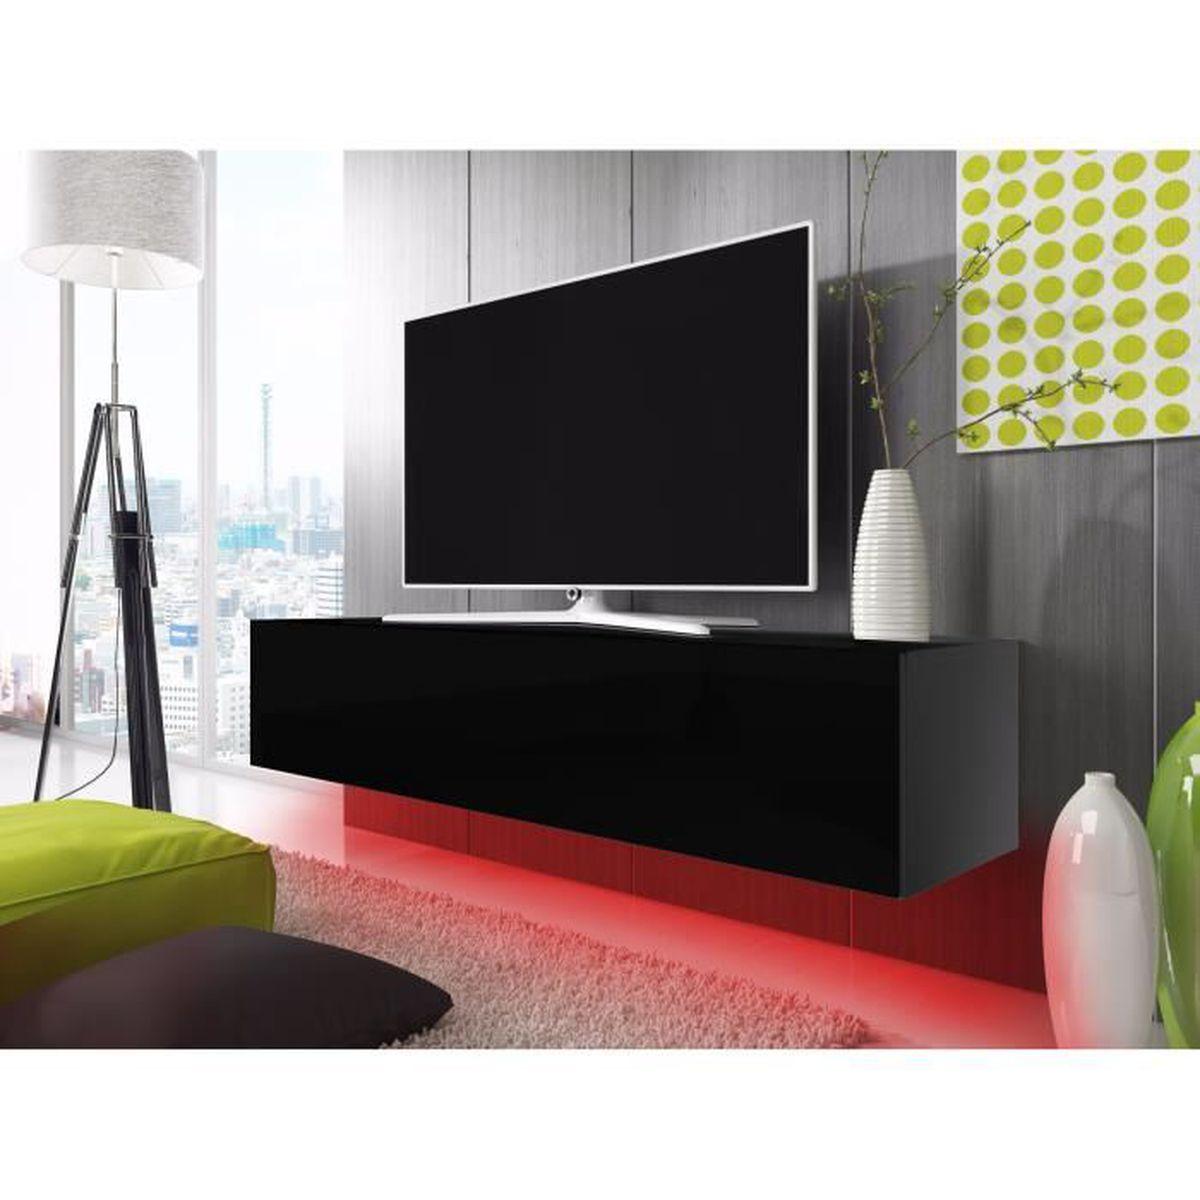 Meuble tv lana avec led rouge noir mat noir brillant for Finlandek meuble tv mural katso 160 cm coloris blanc et noir